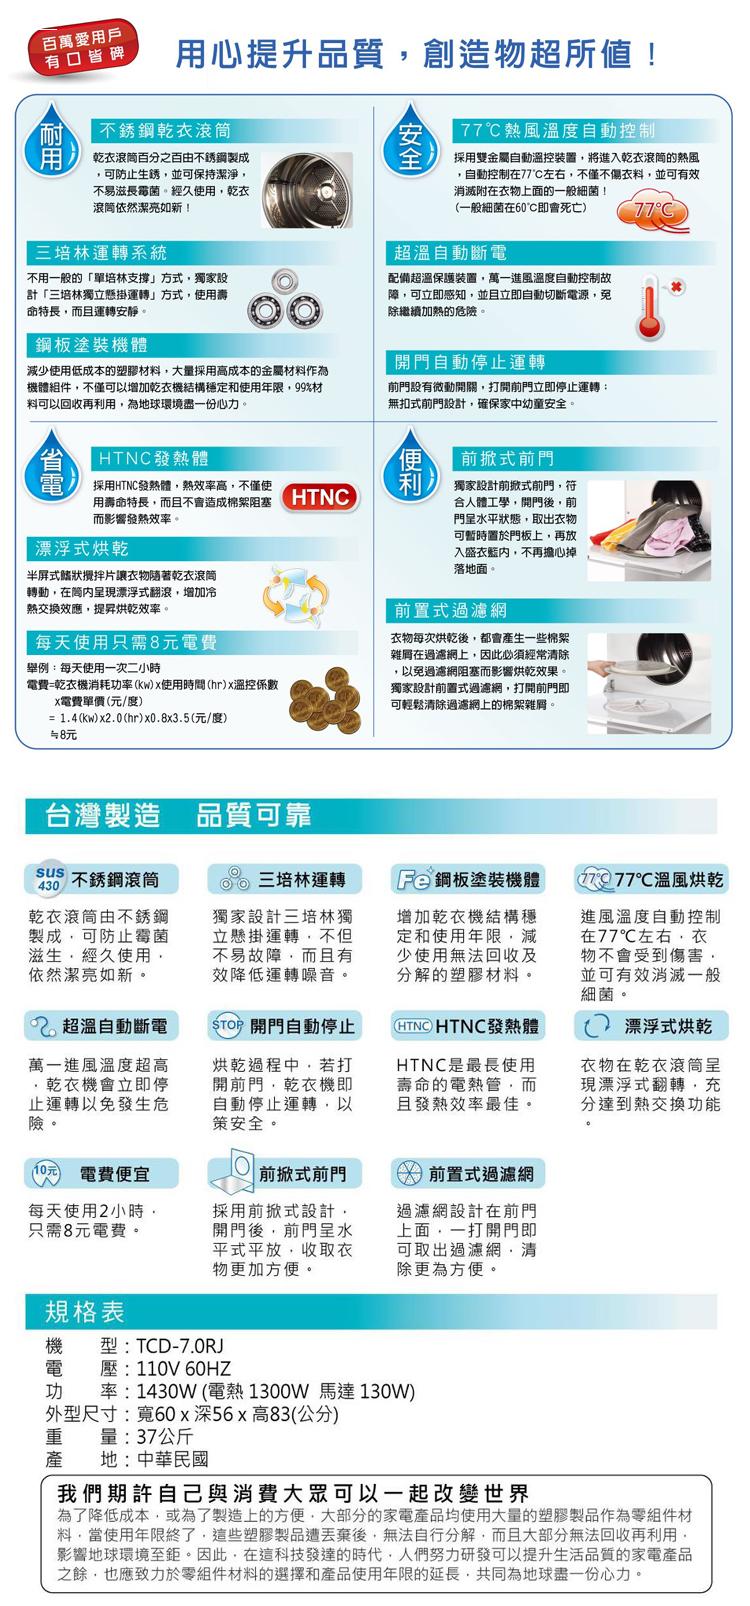 https://shop.r10s.com/5f6a3510-ec8c-11e4-ac44-005056b756e3/upload/Dryers/TCD-70RJ3.jpg